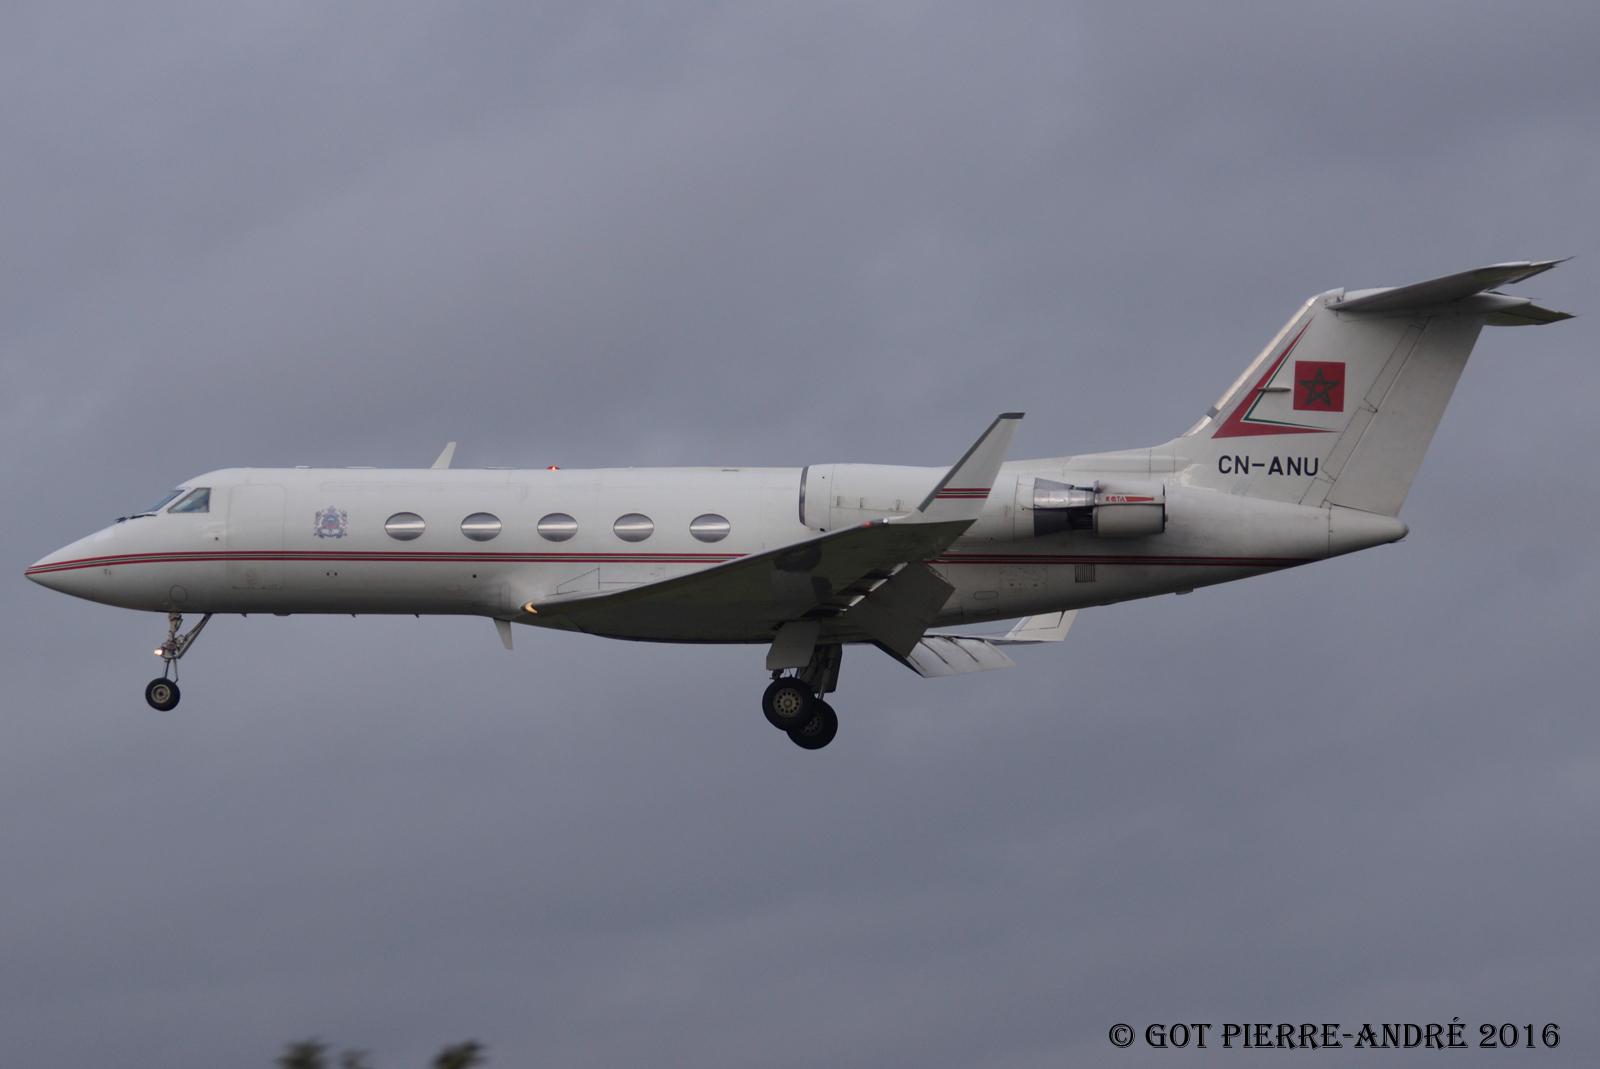 FRA: Avions VIP, Liaison & ECM - Page 12 25168604400_aa579554f9_o